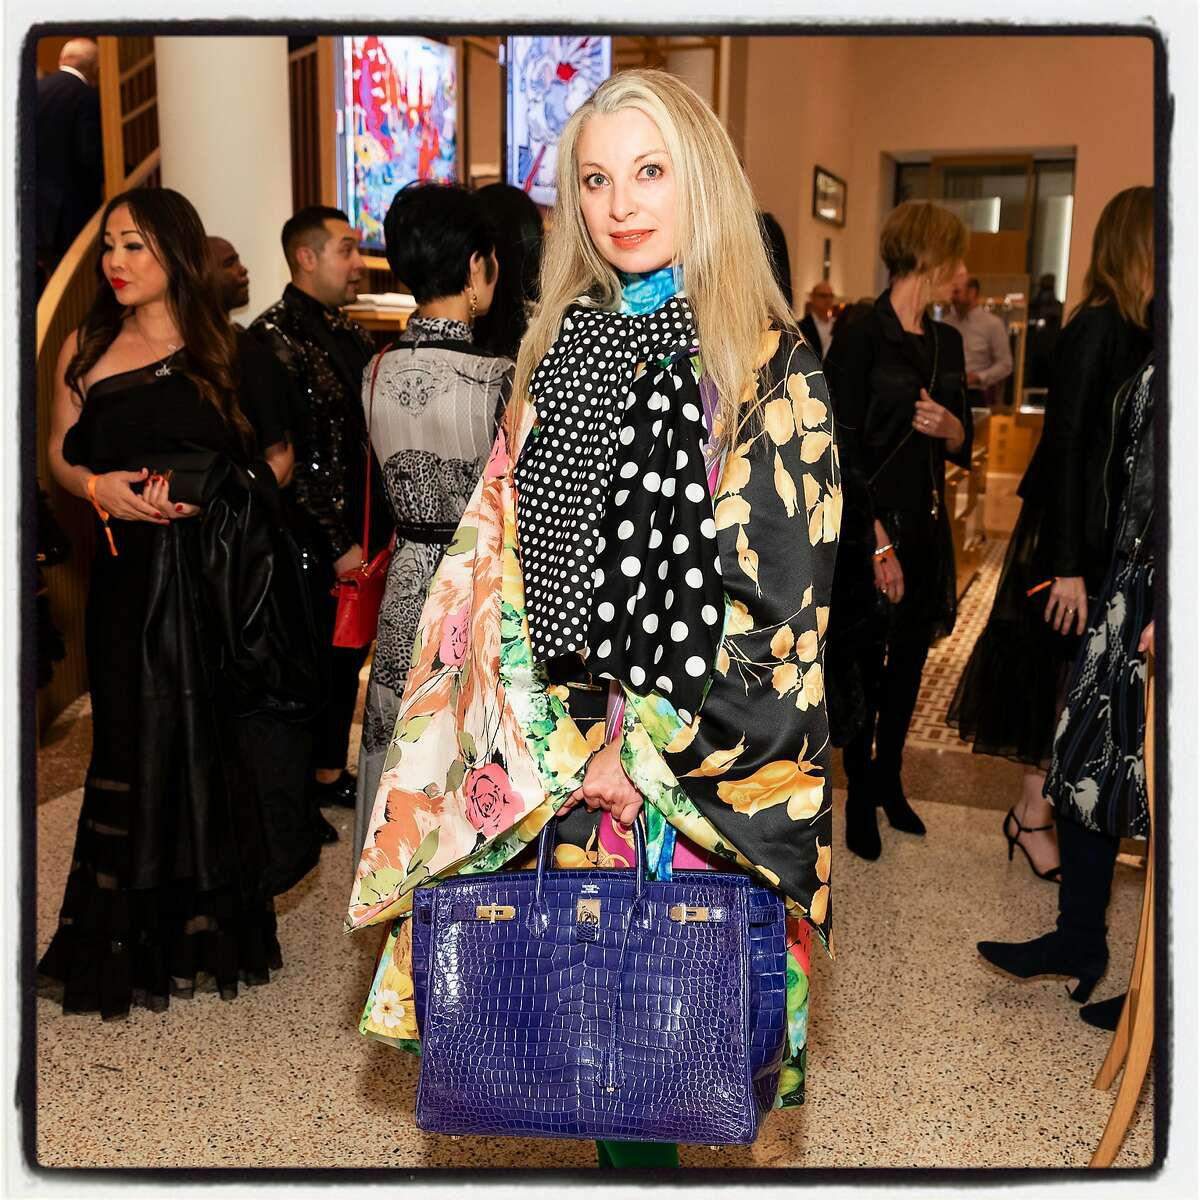 Sonya Molodetskaya with a big Hermes Birkin at the reopening on Nov. 14, 2019.